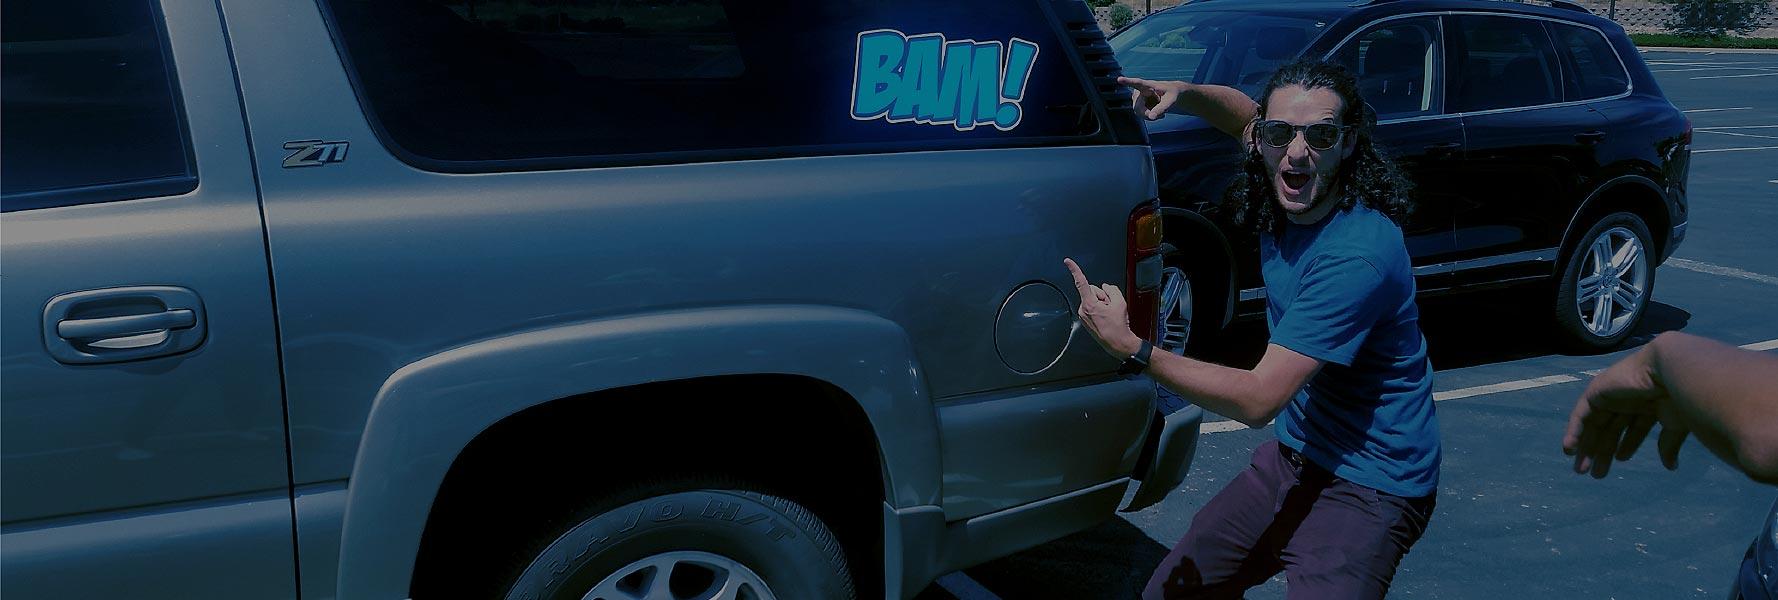 brad millett with BAM sticker on car